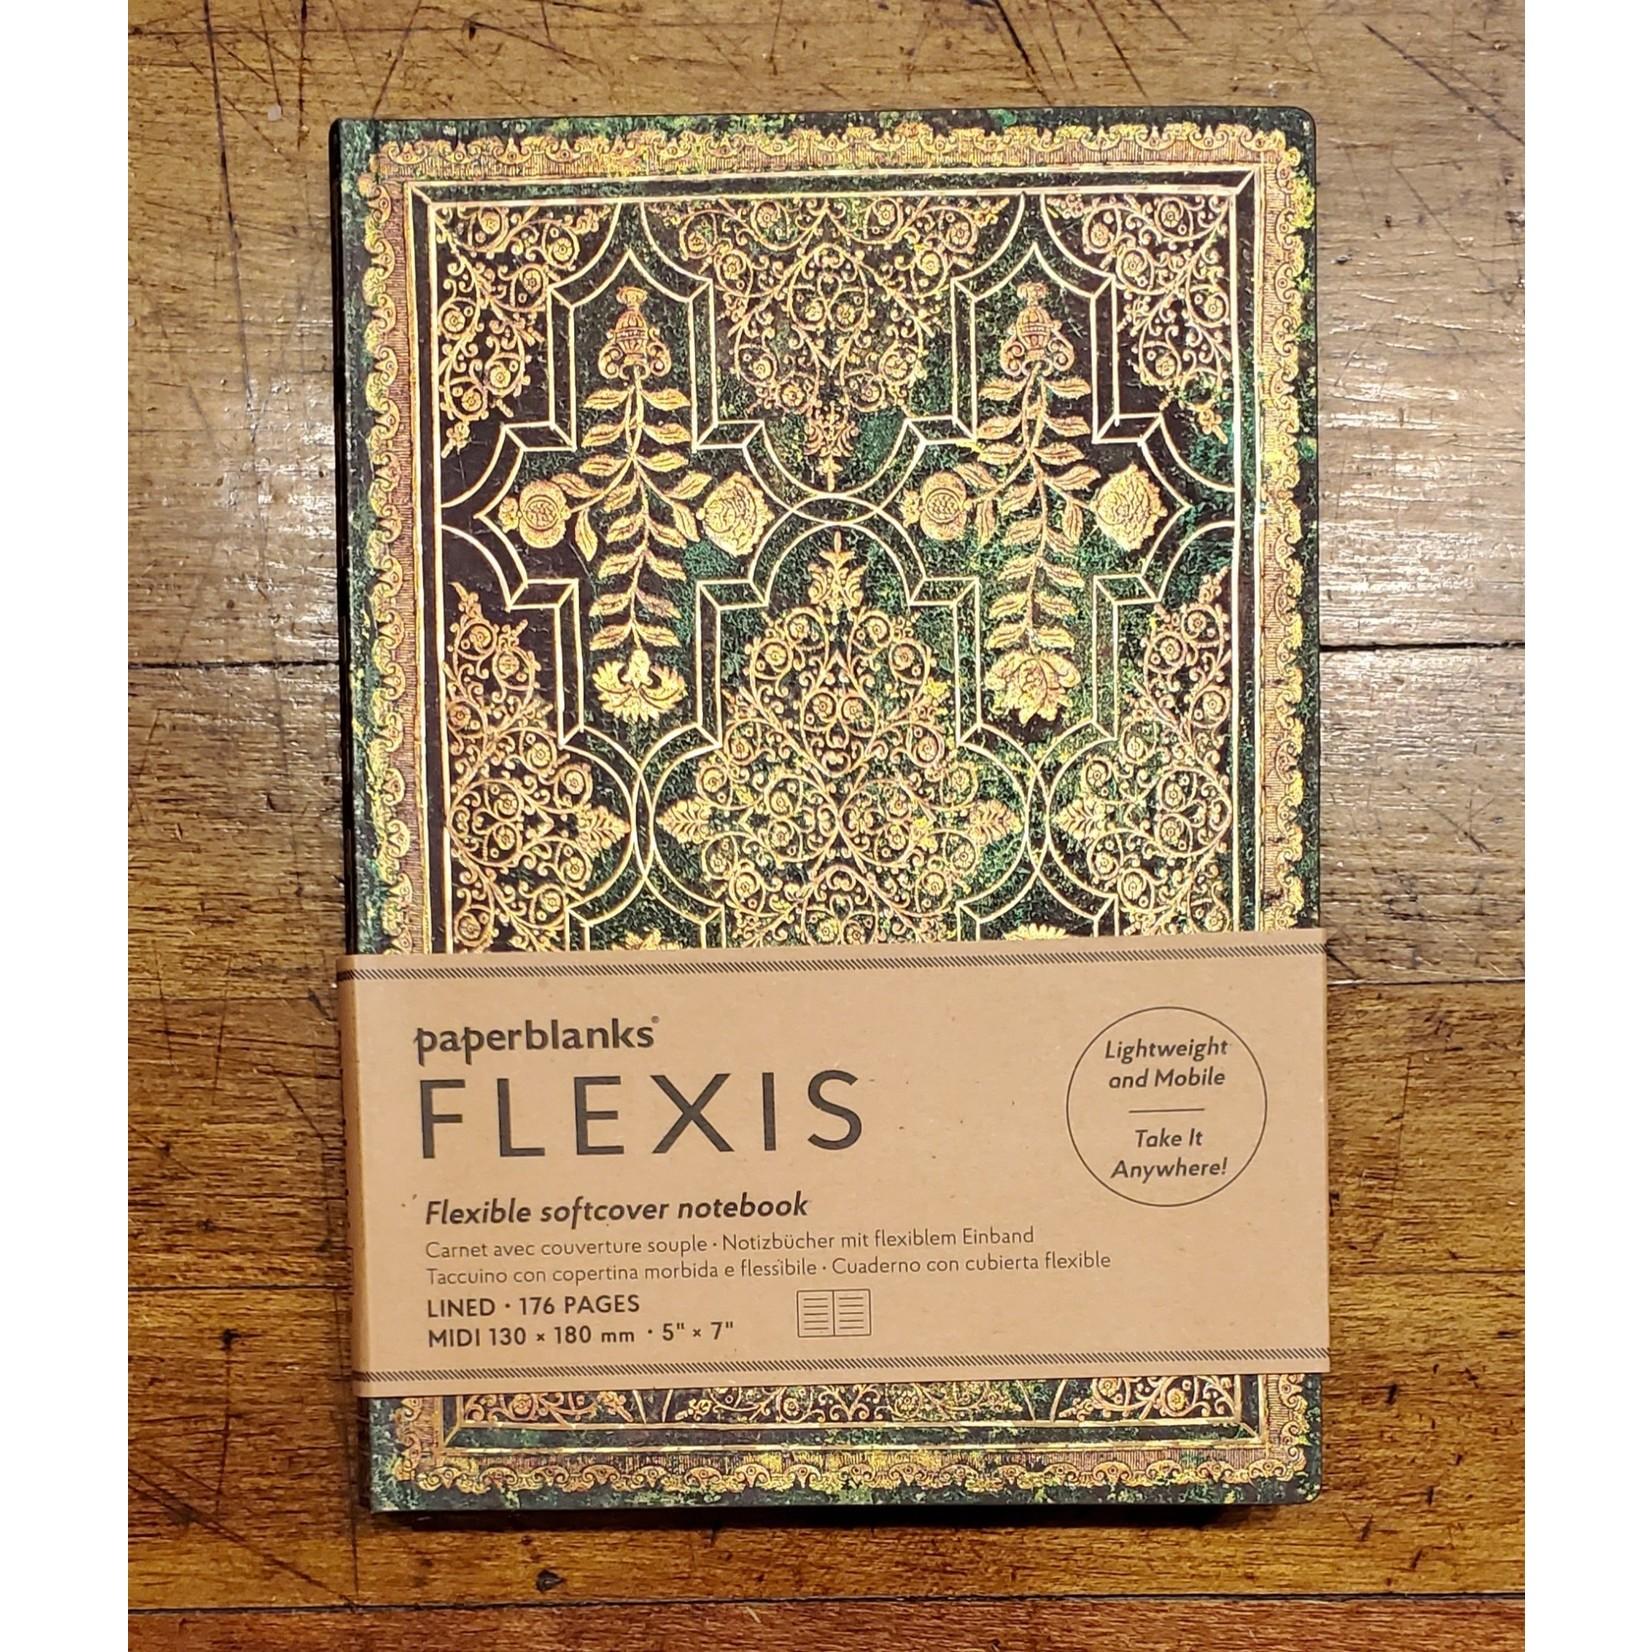 Paperblanks Journal Flexis: